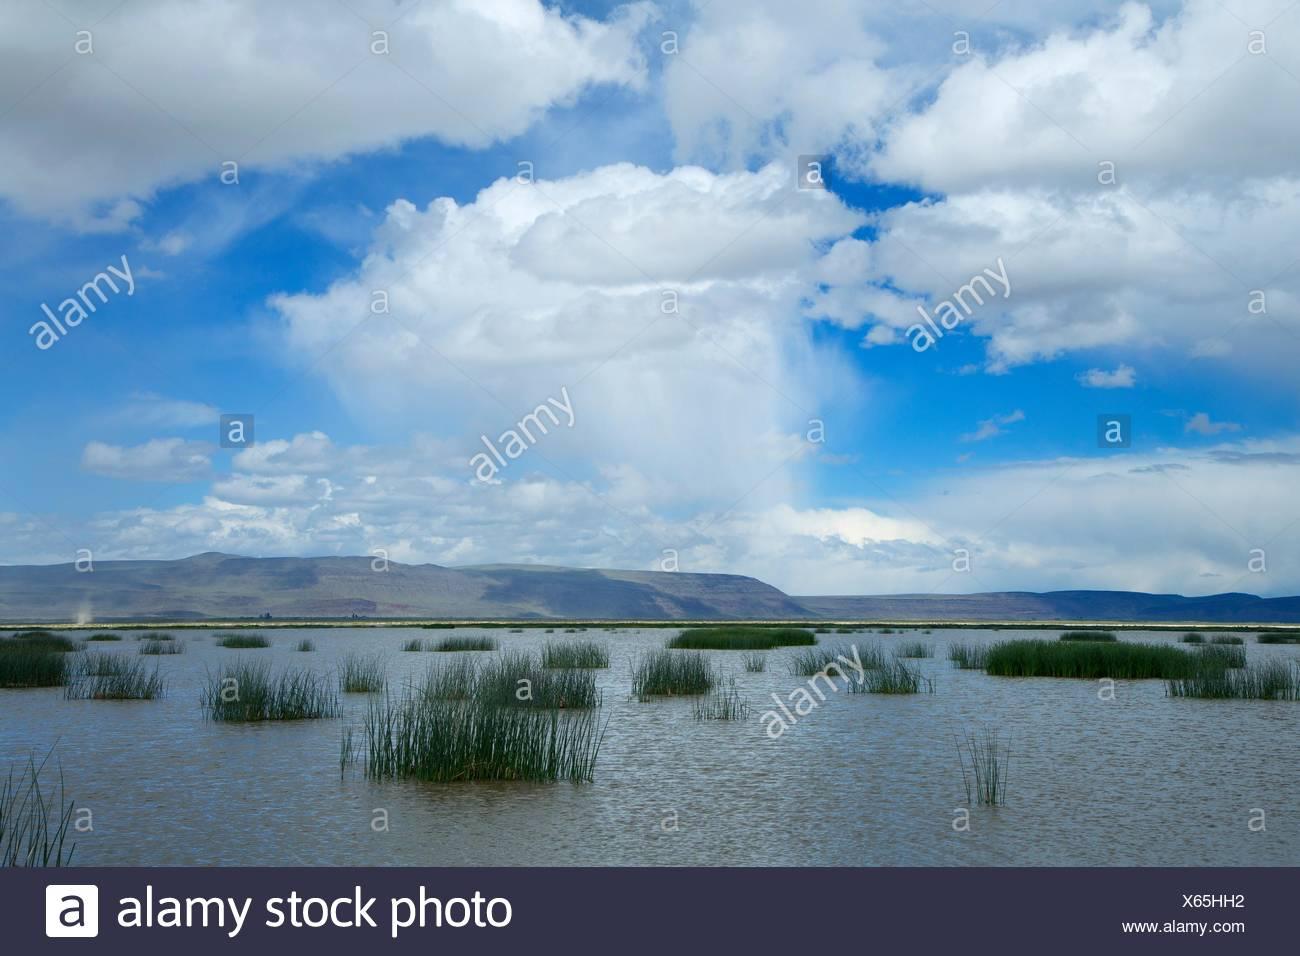 Wetland along Tour Route, Summer Lake Wildlife Area, Oregon Outback Scenic Byway, Oregon. - Stock Image